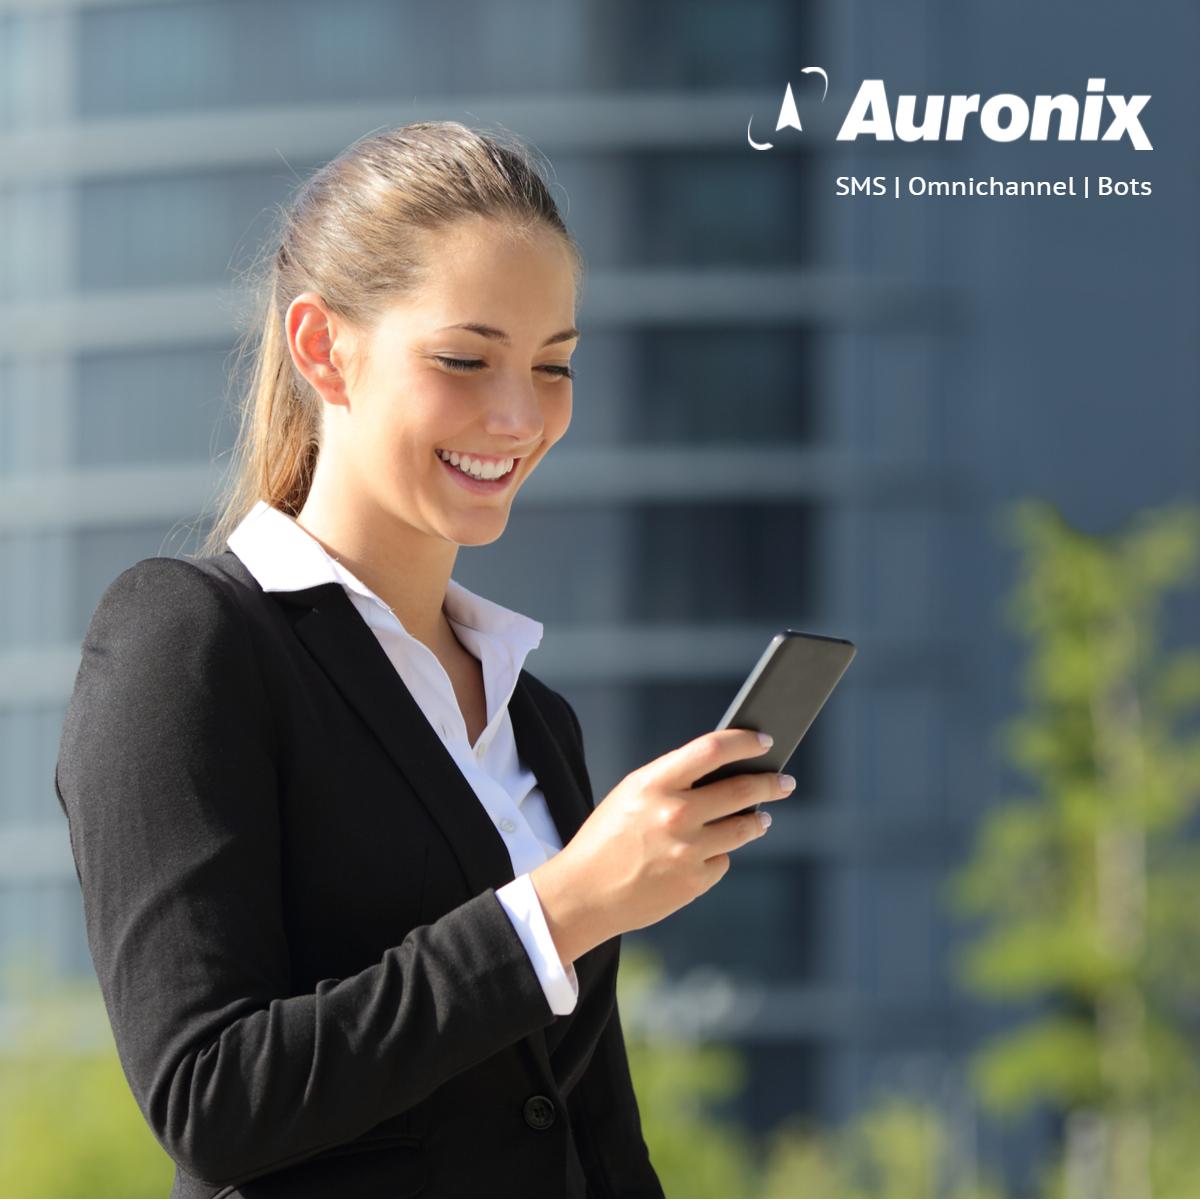 auronix sms omnichannel bots